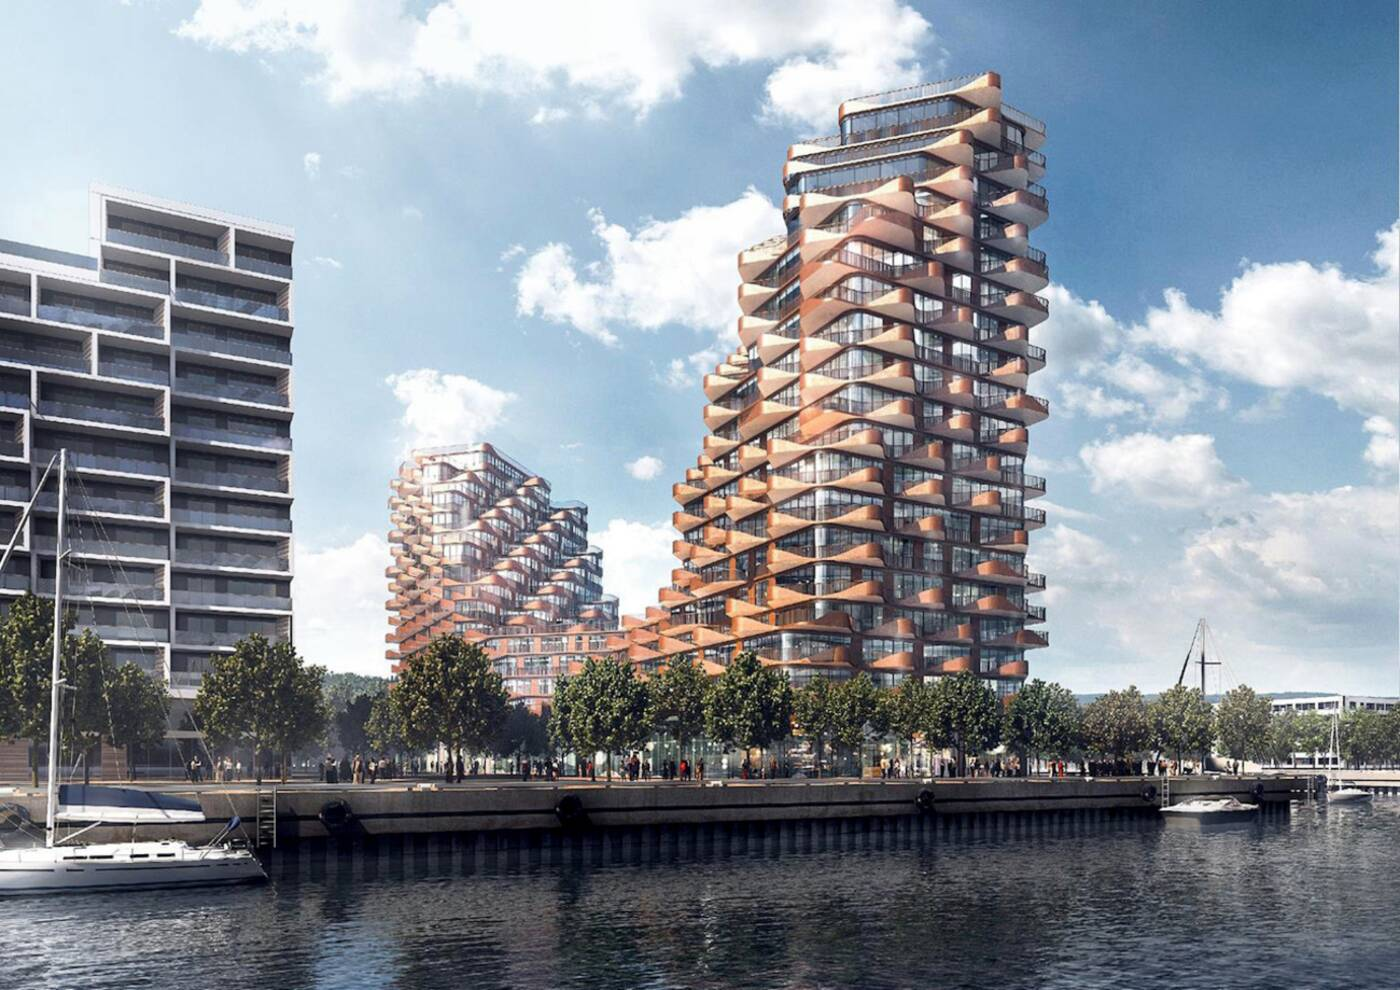 Toronto condo design is set to take a major leap forward